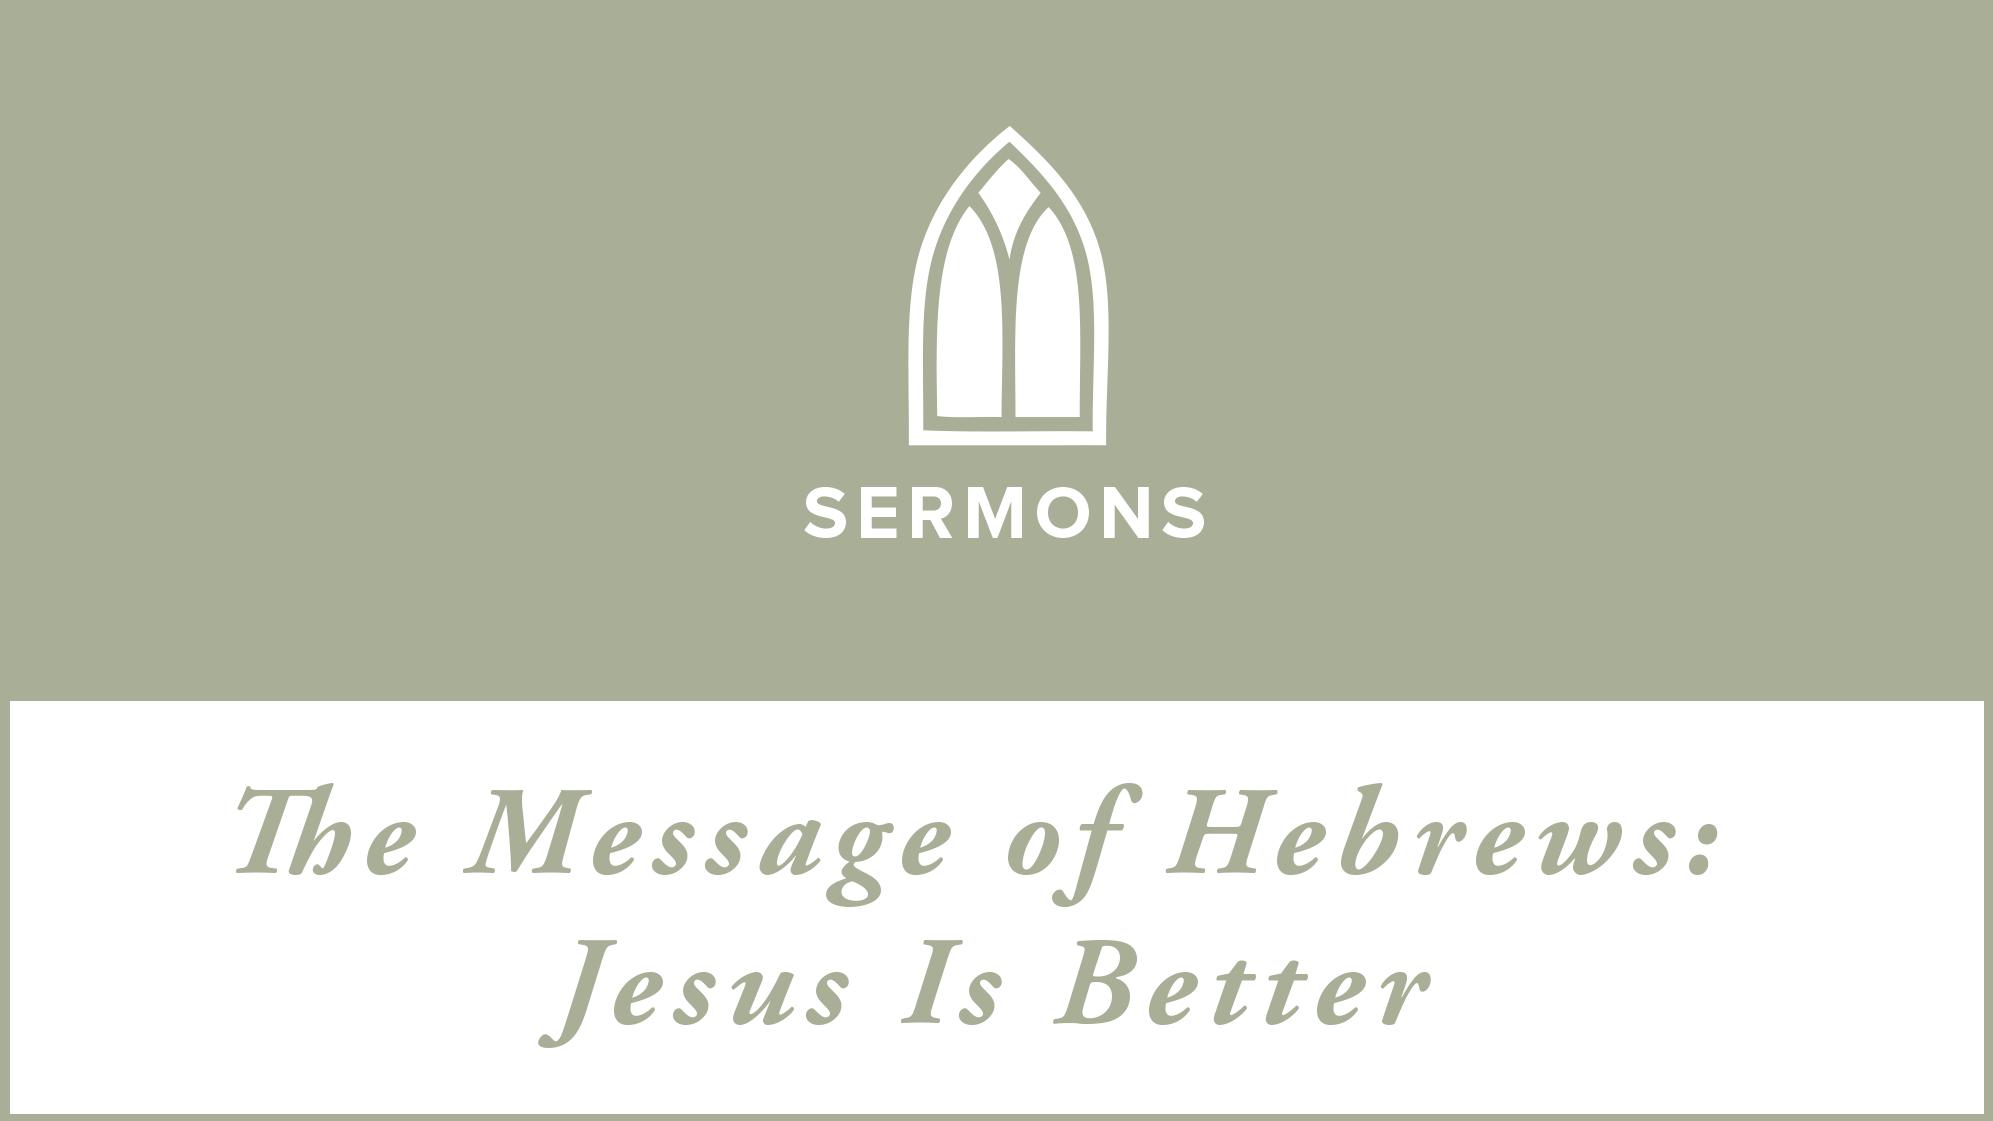 Hebrews-16x9.png